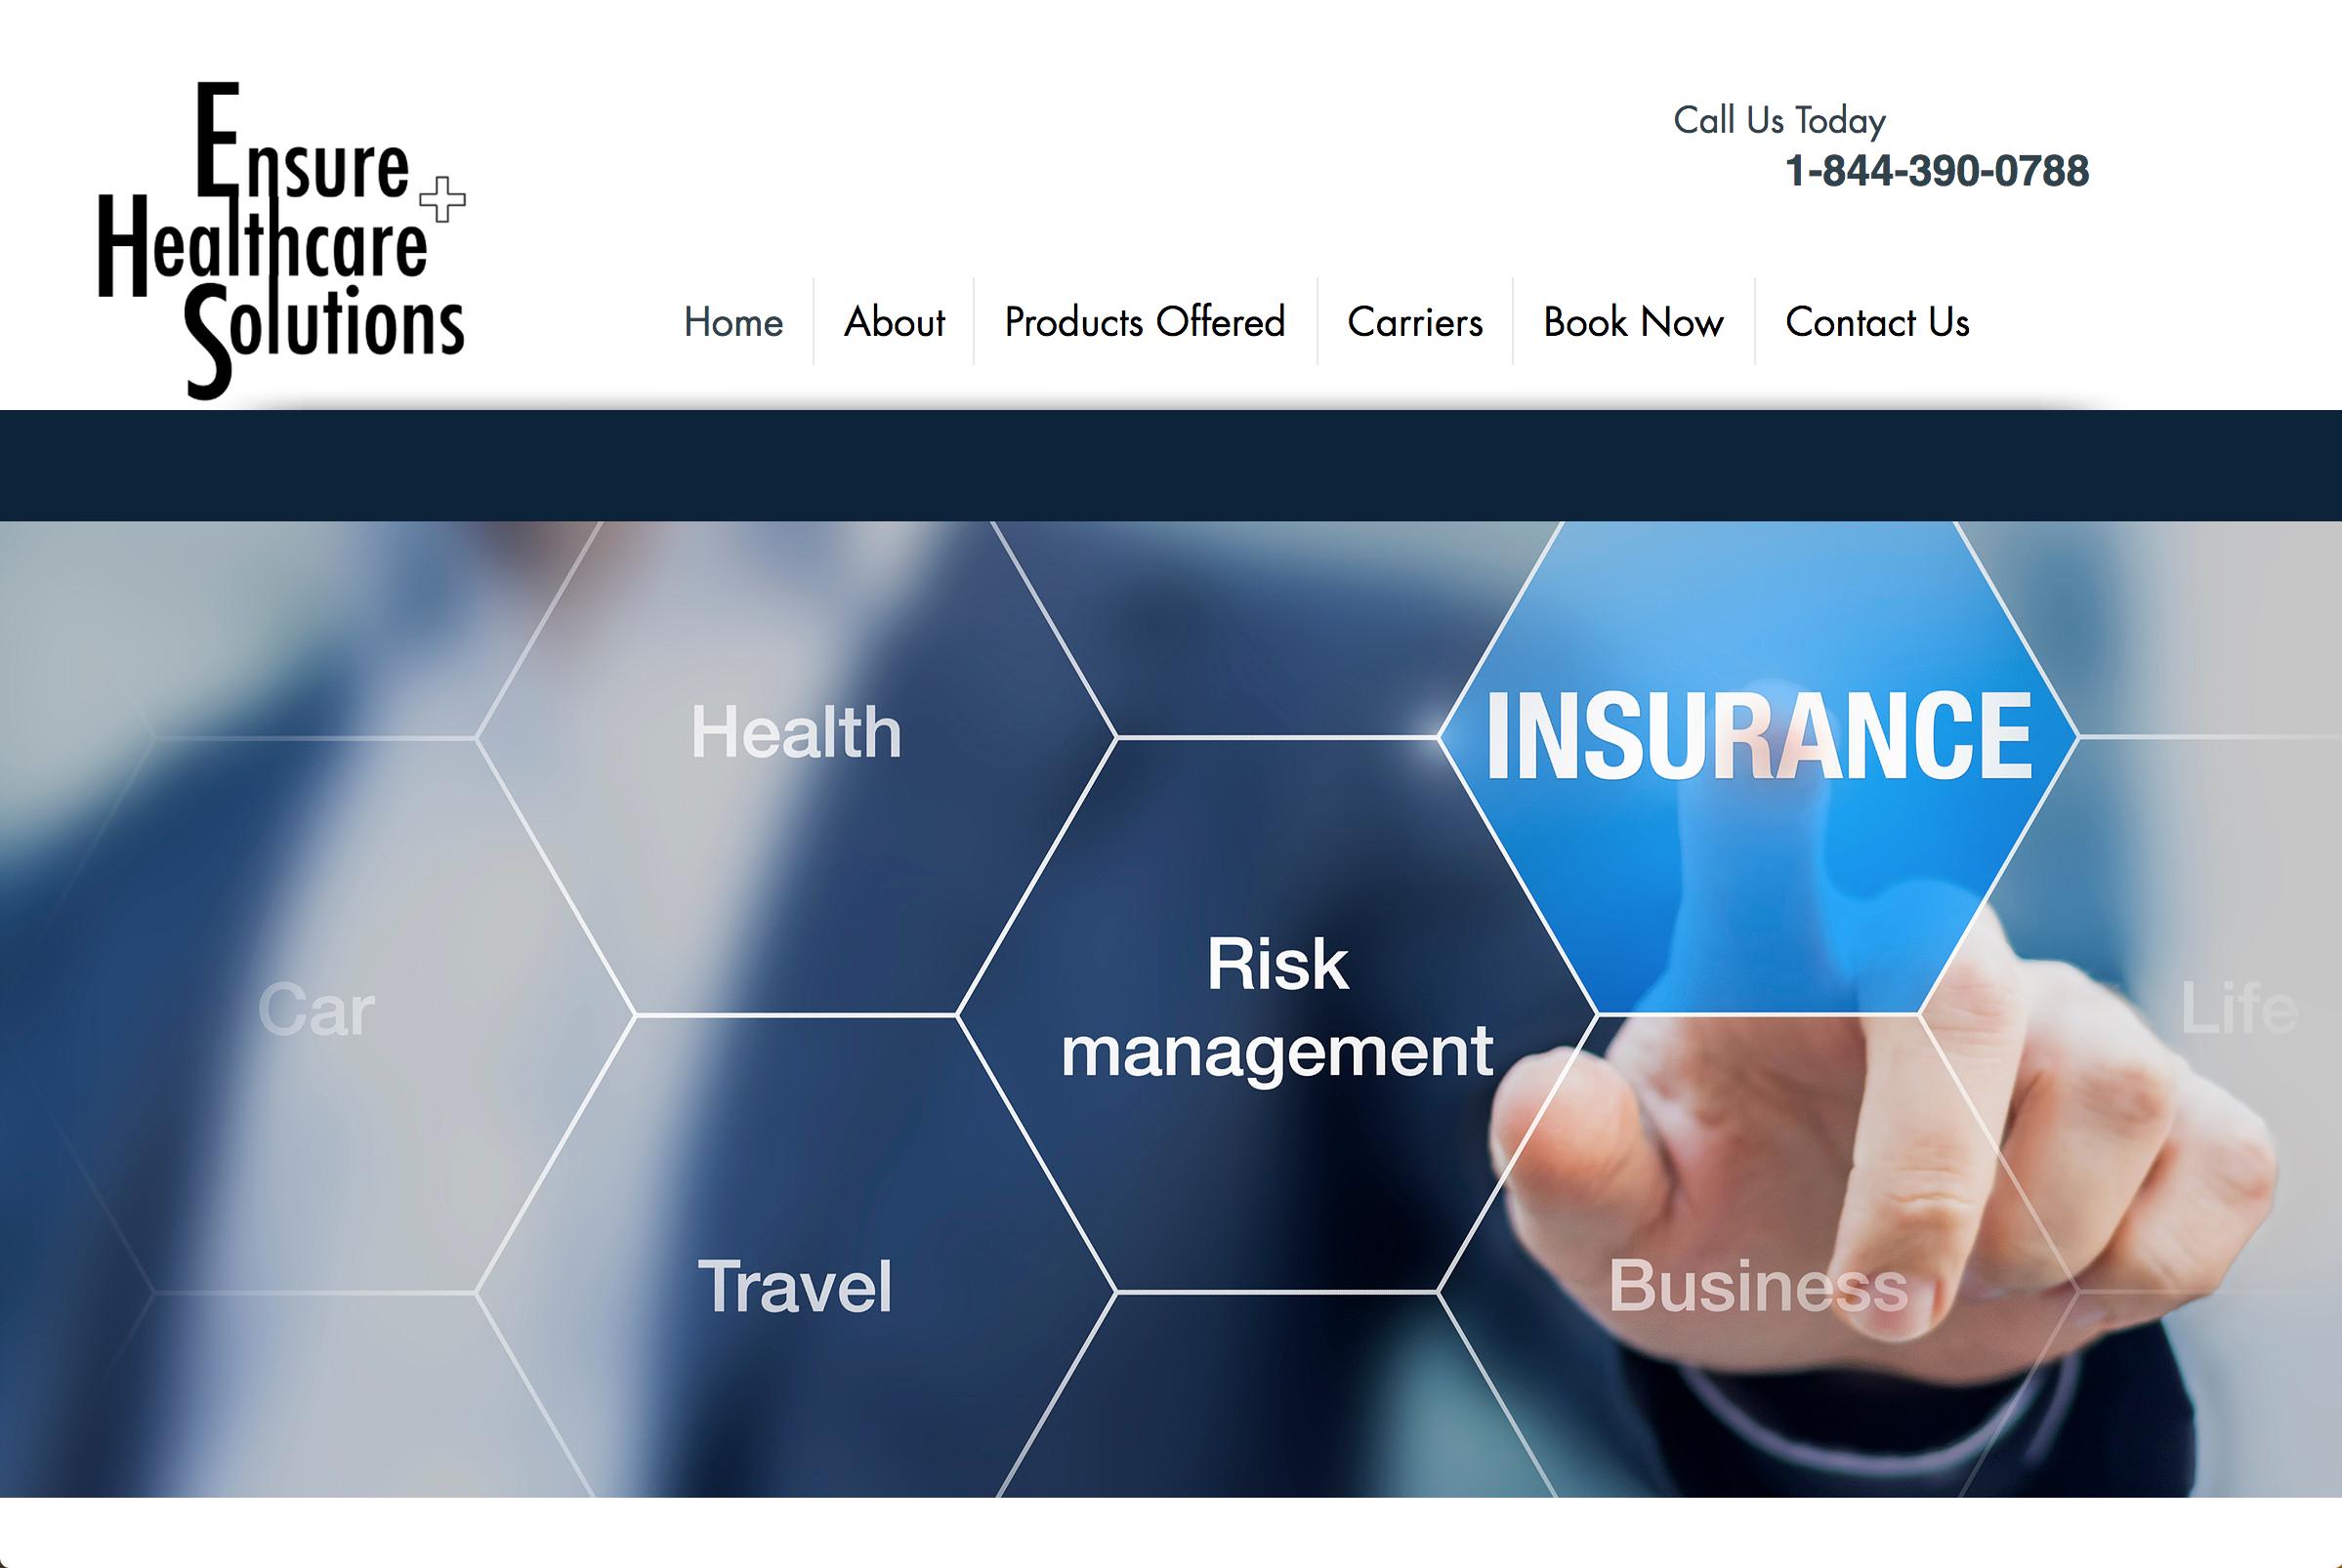 ensure healthcare solutions -